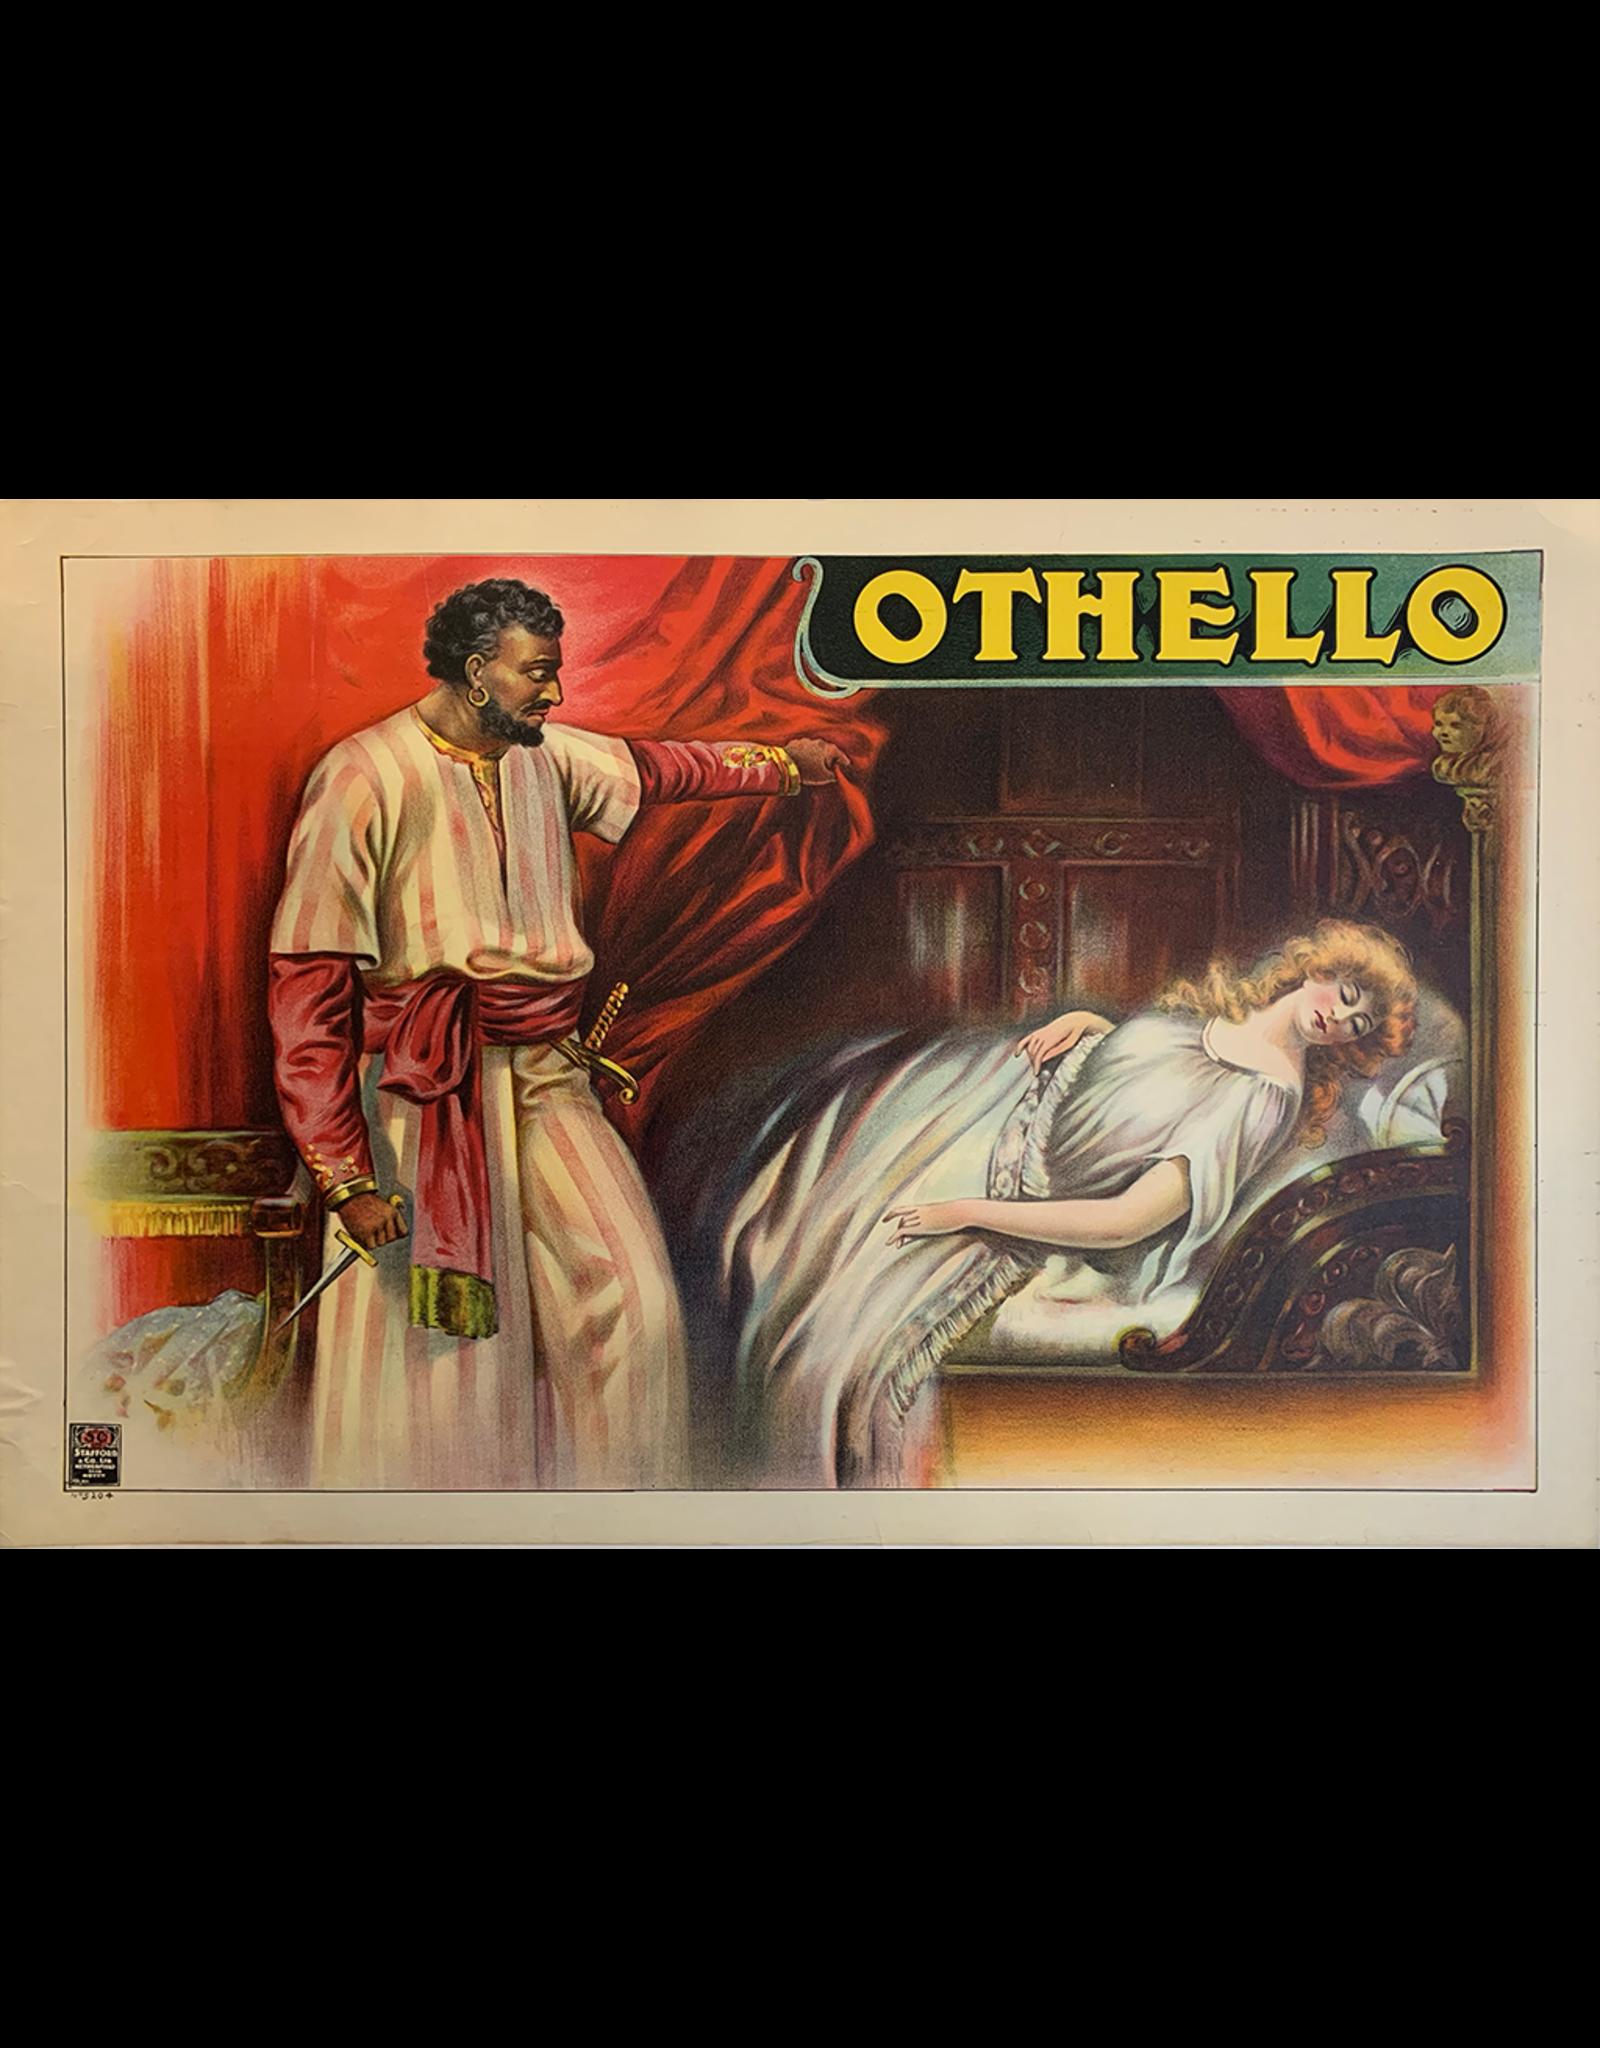 SPV Othello, 1910, England